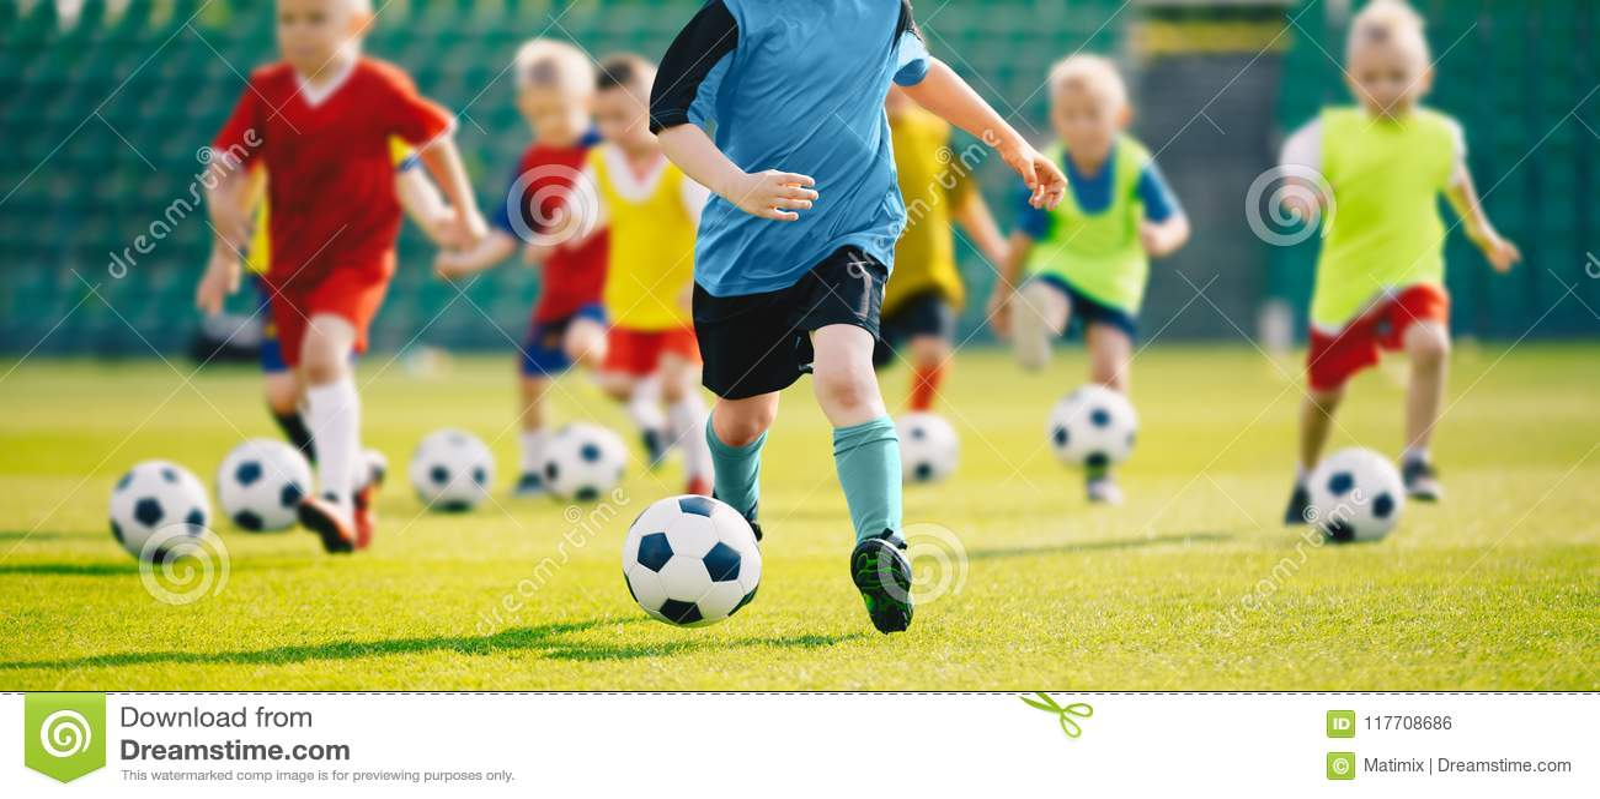 Football soccer training for kids. Young boys improving soccer skills Children football training